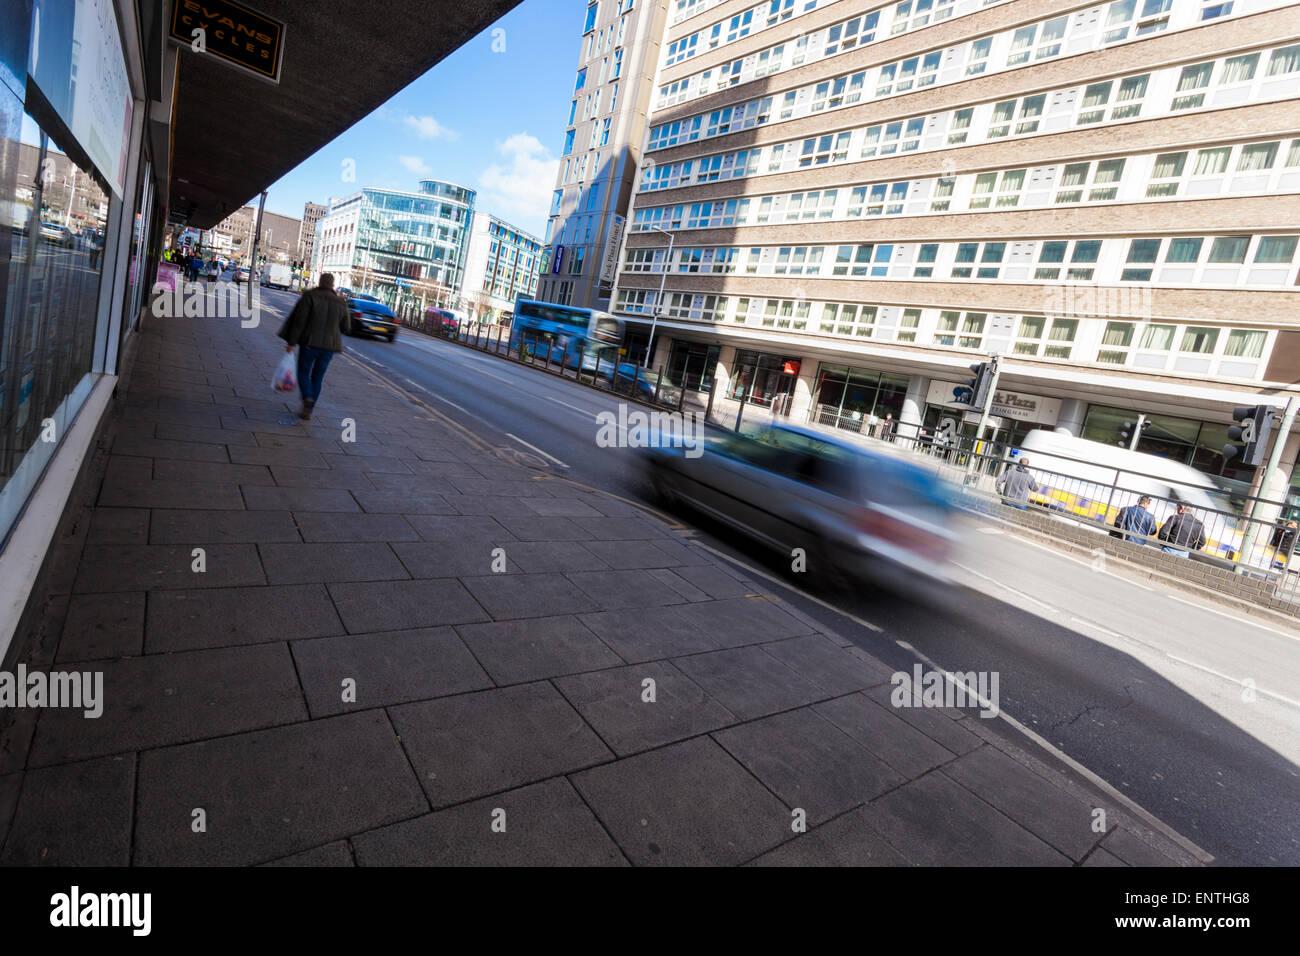 Modern city street and buildings. Maid Marian Way, Nottingham, England, UK - Stock Image